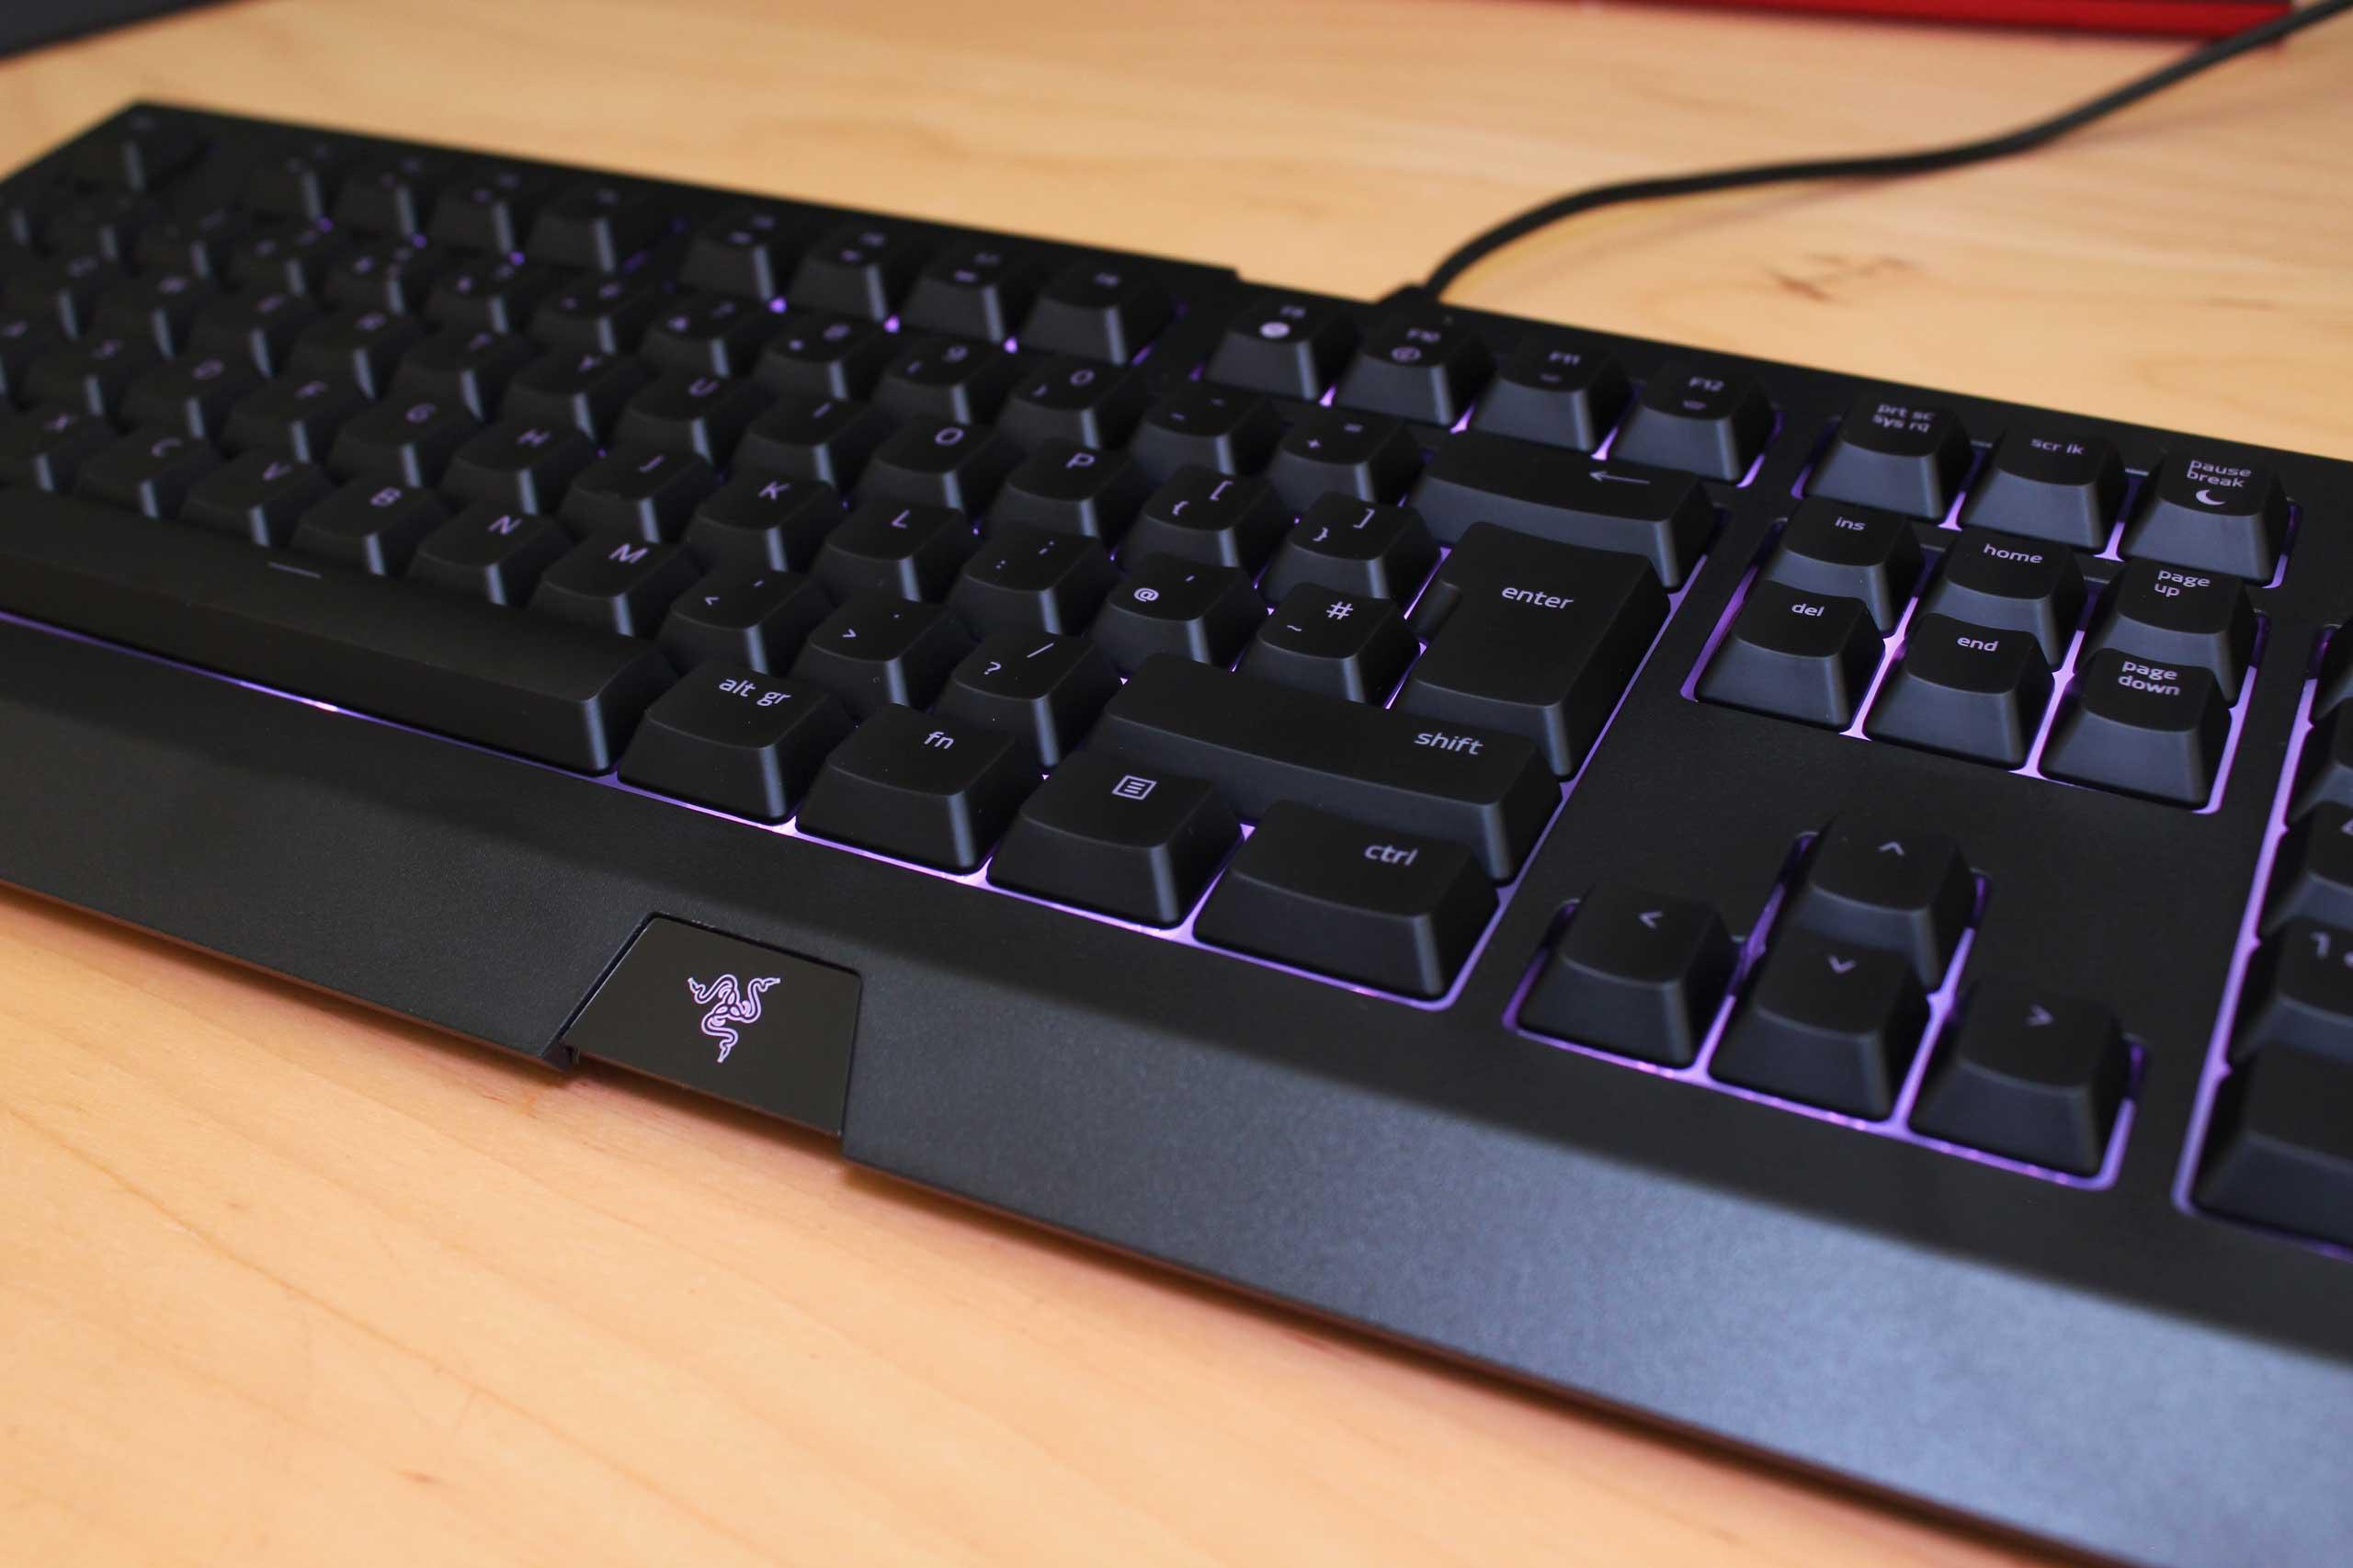 Razer Cynosa Chroma Gaming Keyboard Review Vgu